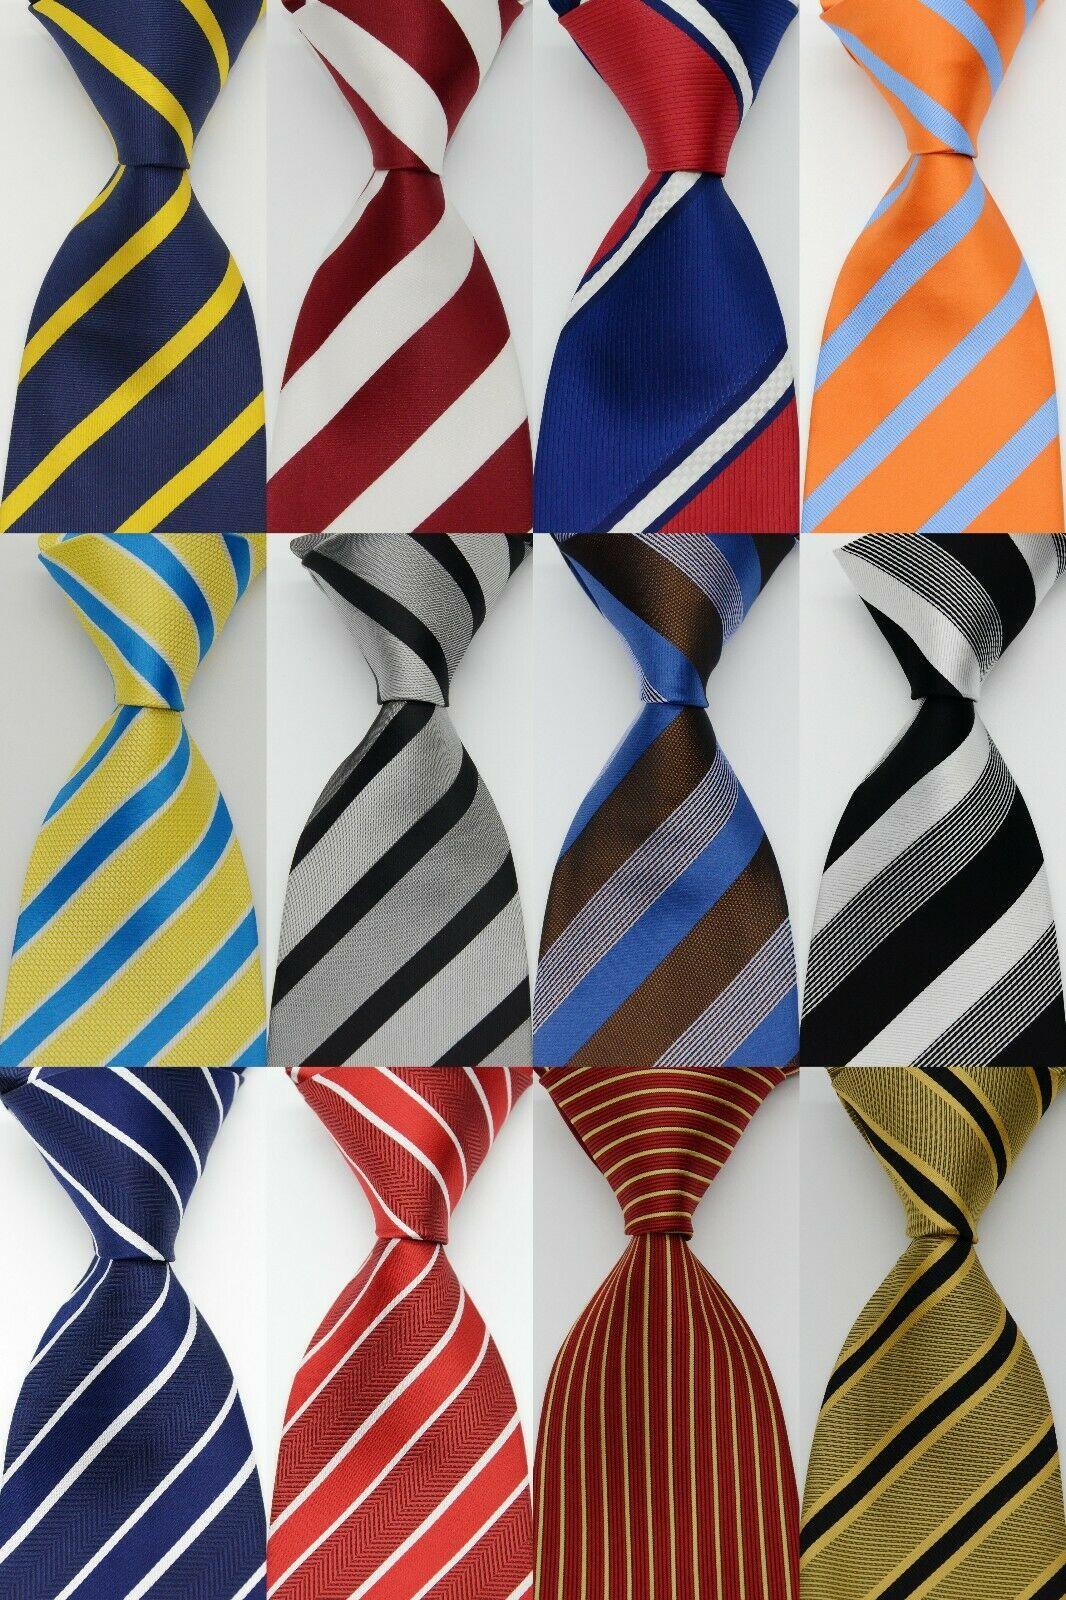 Men's Striped Tie 100% Silk 9cm Yellow Blue Red Pink Jacquard Party Wedding Woven Fashion Design Necktie